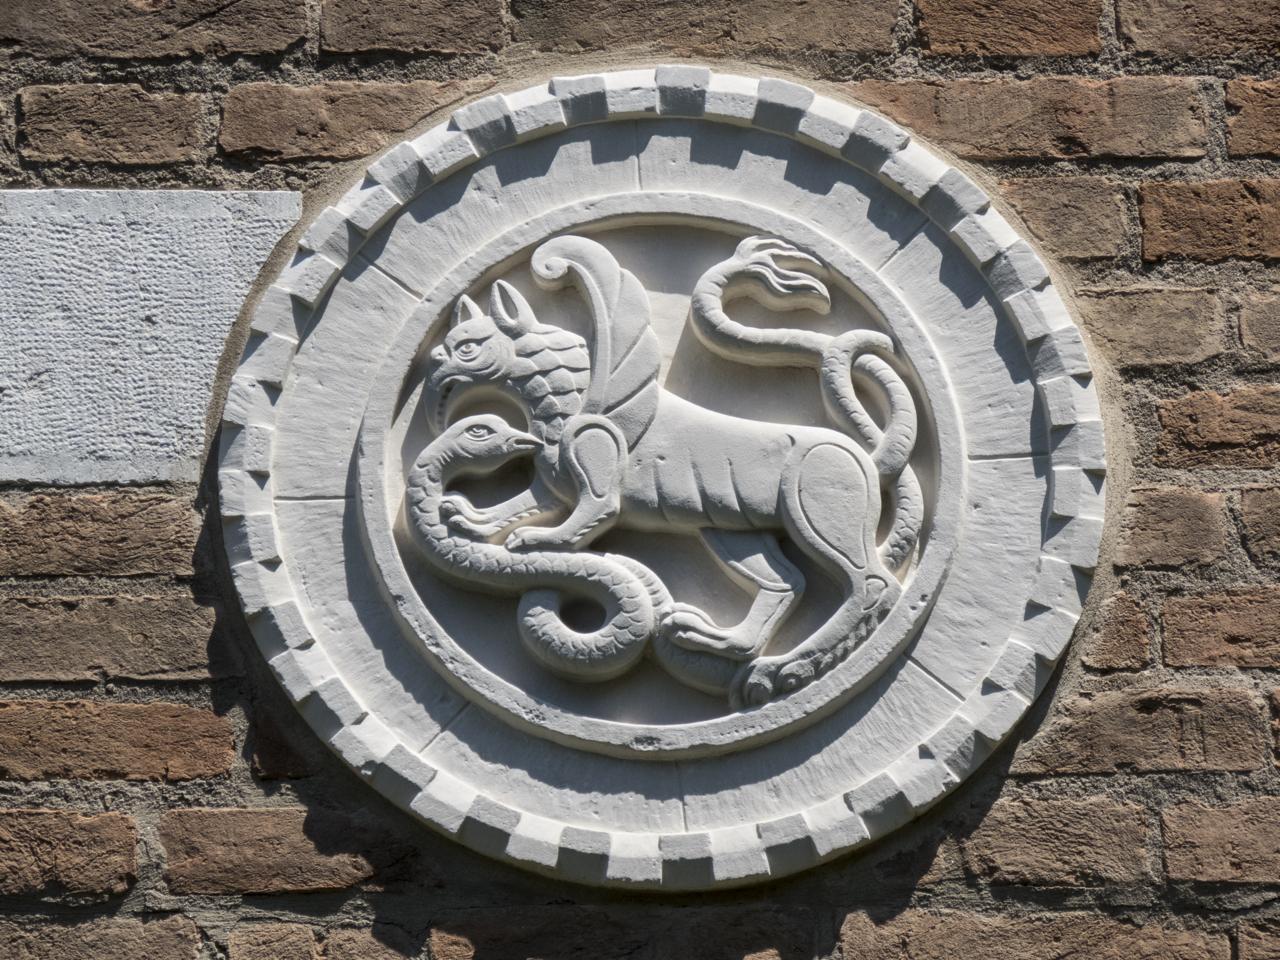 grifone, basilisco, motivi decorativi a dentelli (formella, serie) - ambito veneziano (sec. XX)